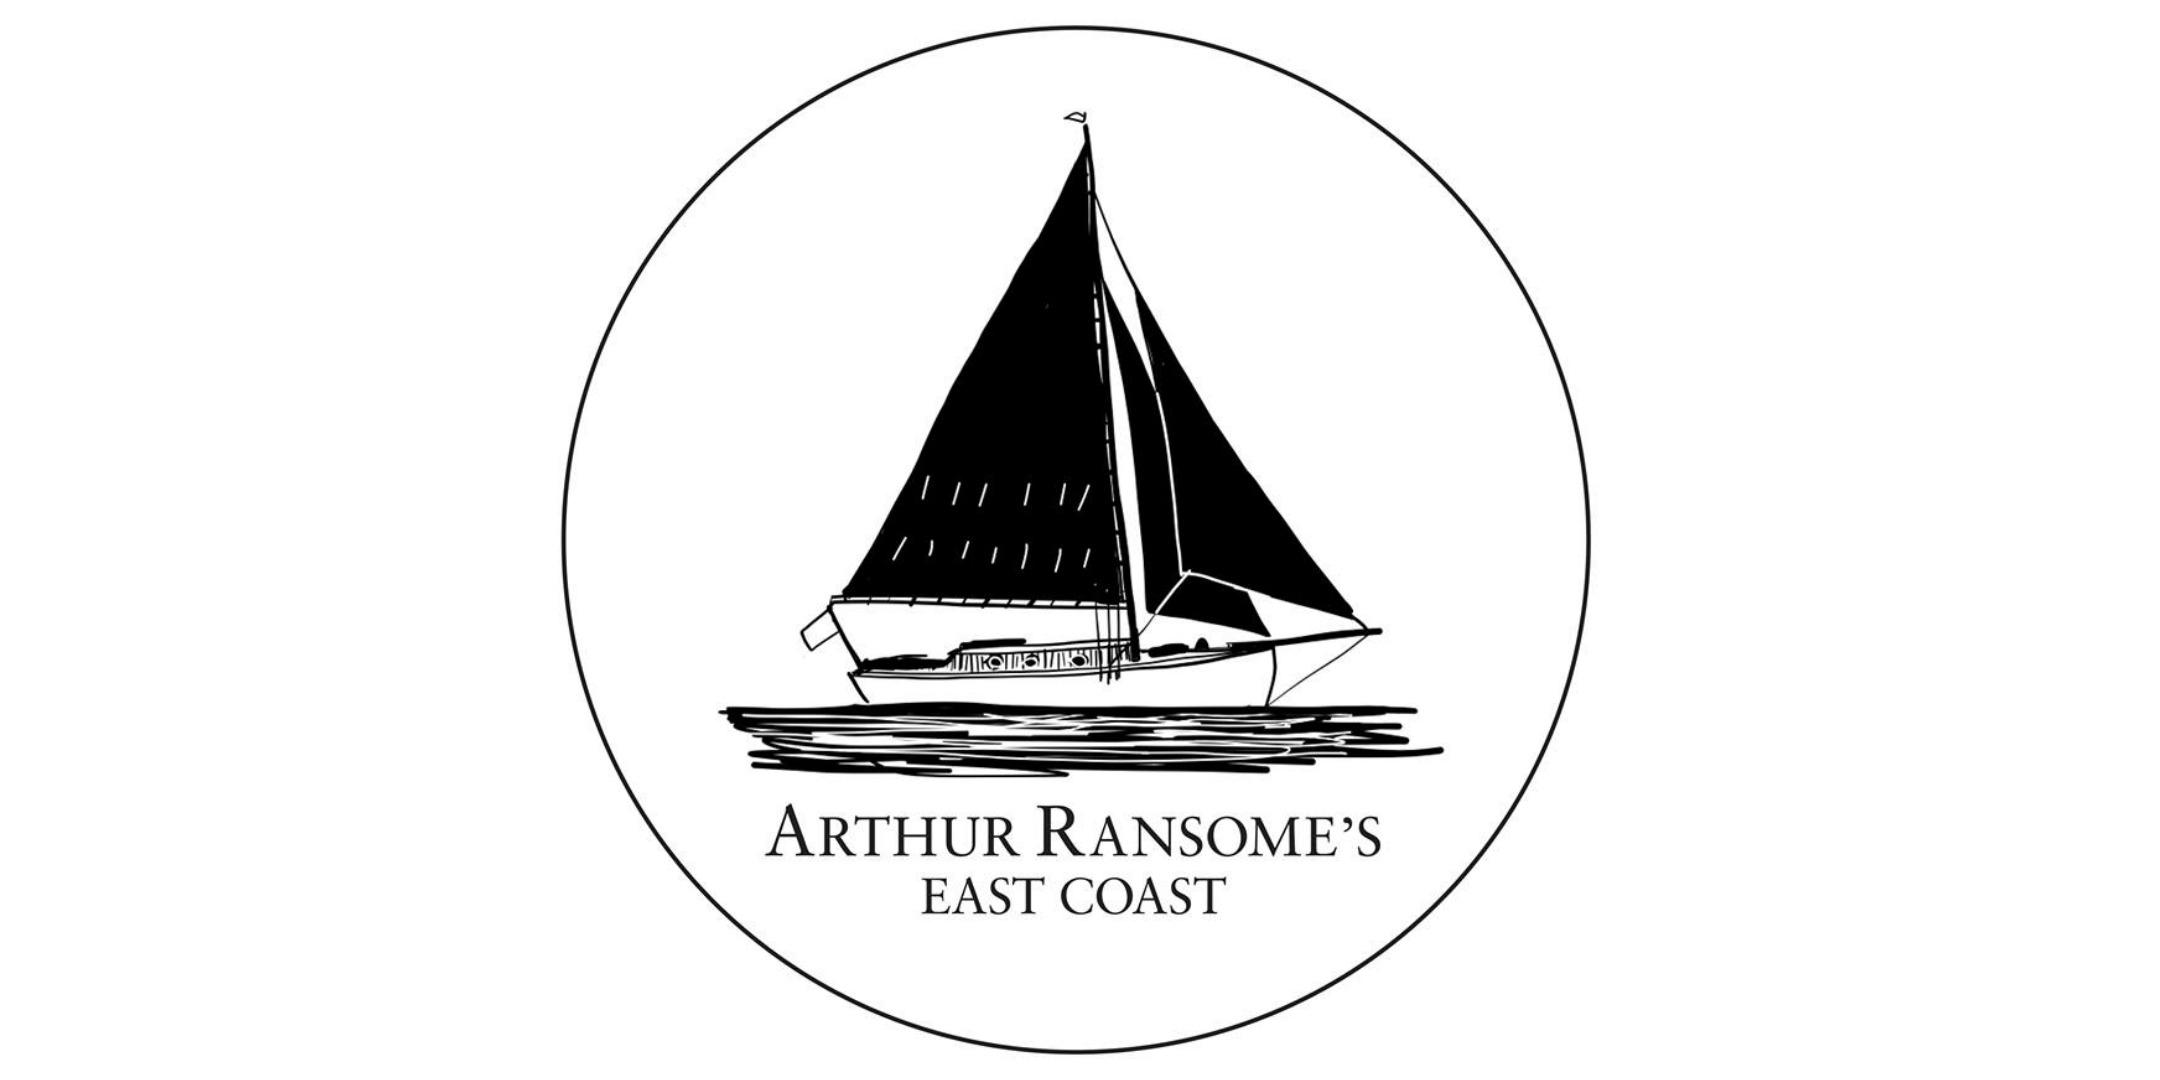 ArthurRansomeEventbrite.jpg?mtime=20170810110103#asset:8992